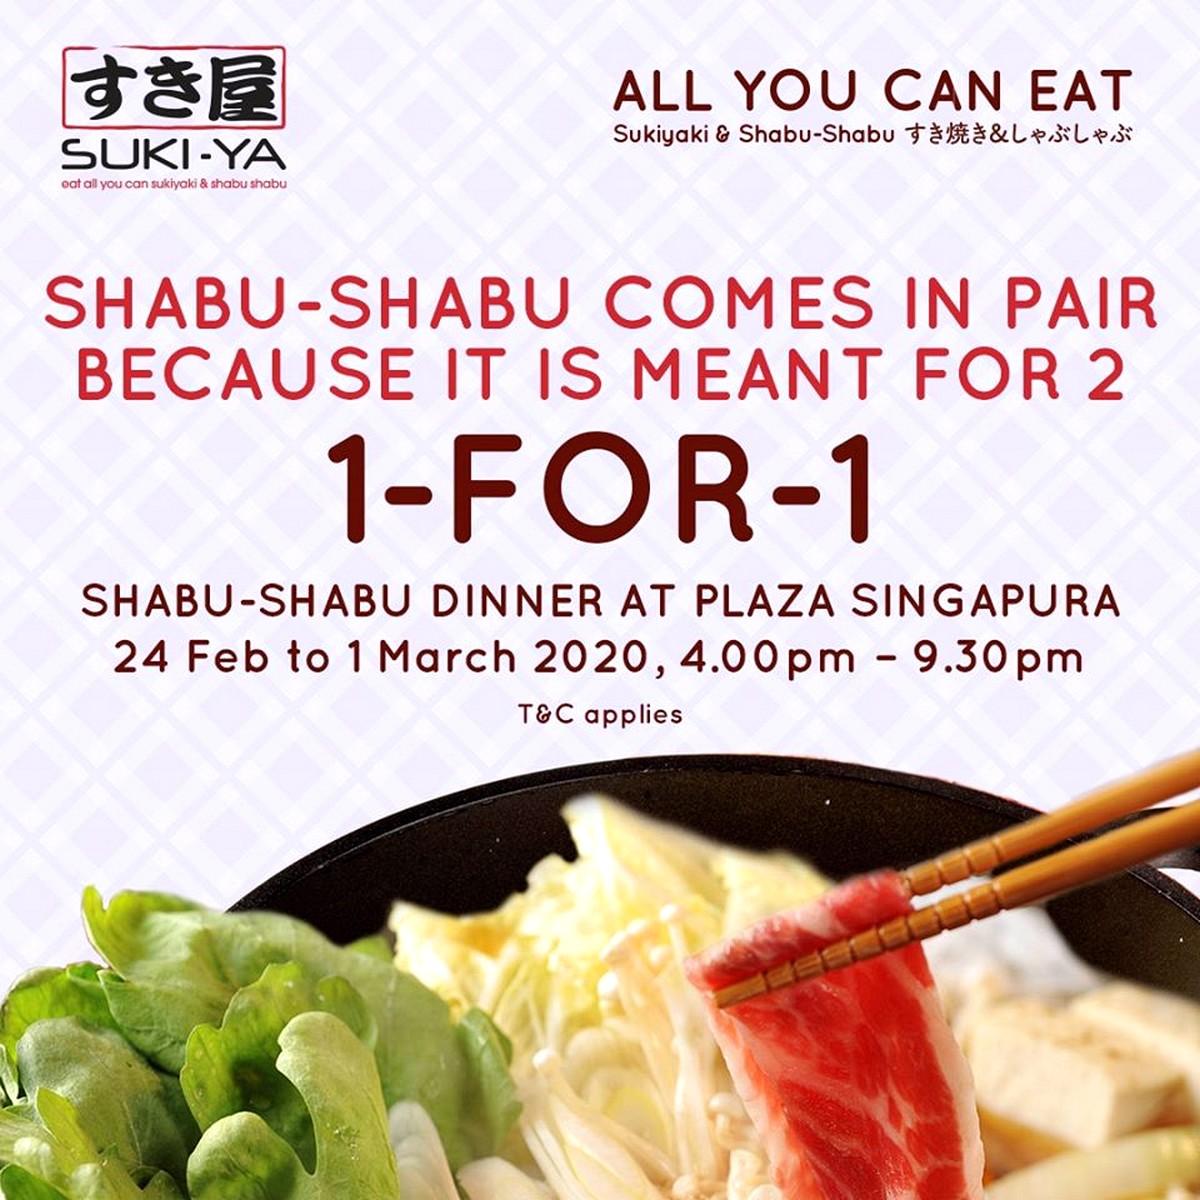 Suki-ya-Shabu-Shabu-2020-Singapore-Sukiyaki-1-For-1-Buy-1-FREE-1-Hot-Pot-Steamboat-Buffet-All-You-Can-Eat-2021-Food-Promotion 24 Feb-1 Mar 2020: Suki-Ya 1-For-1 Buffet Promotion at Plaza Singapura